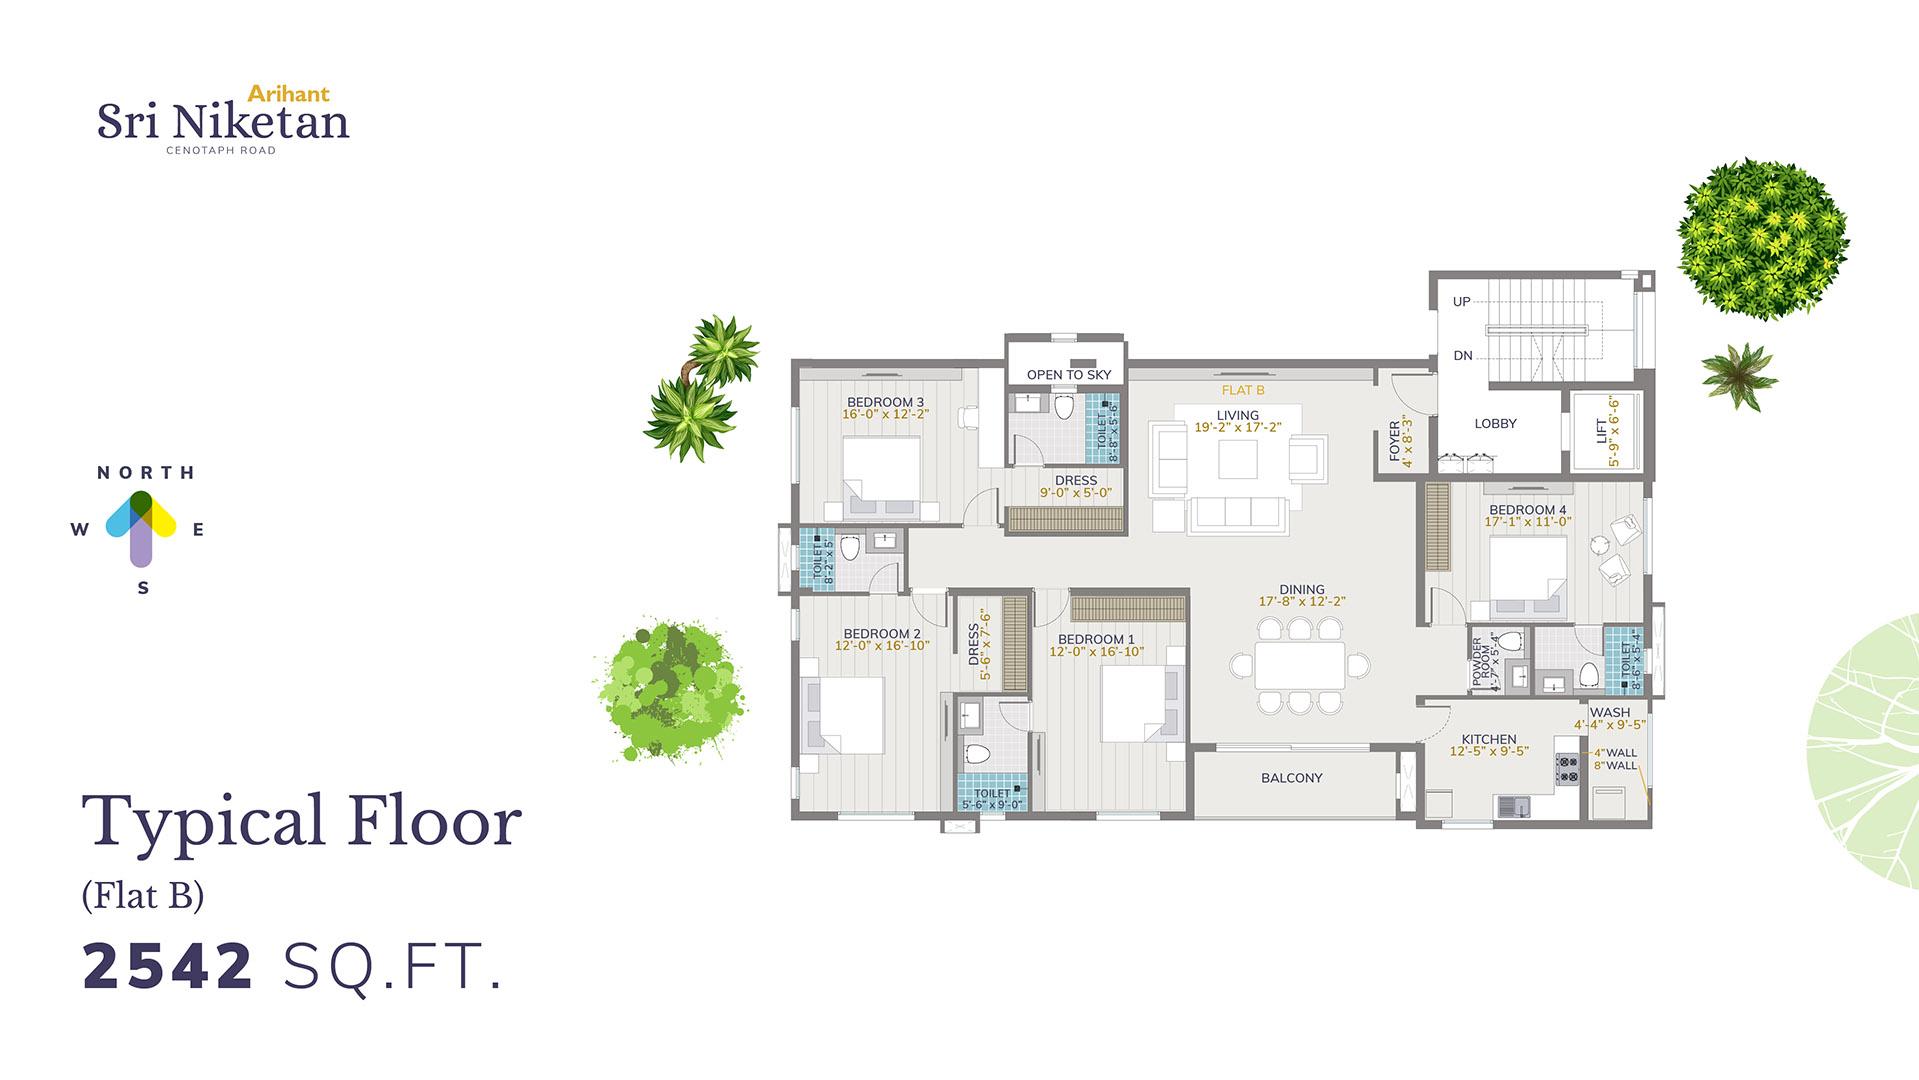 Typical Floor - Flat B